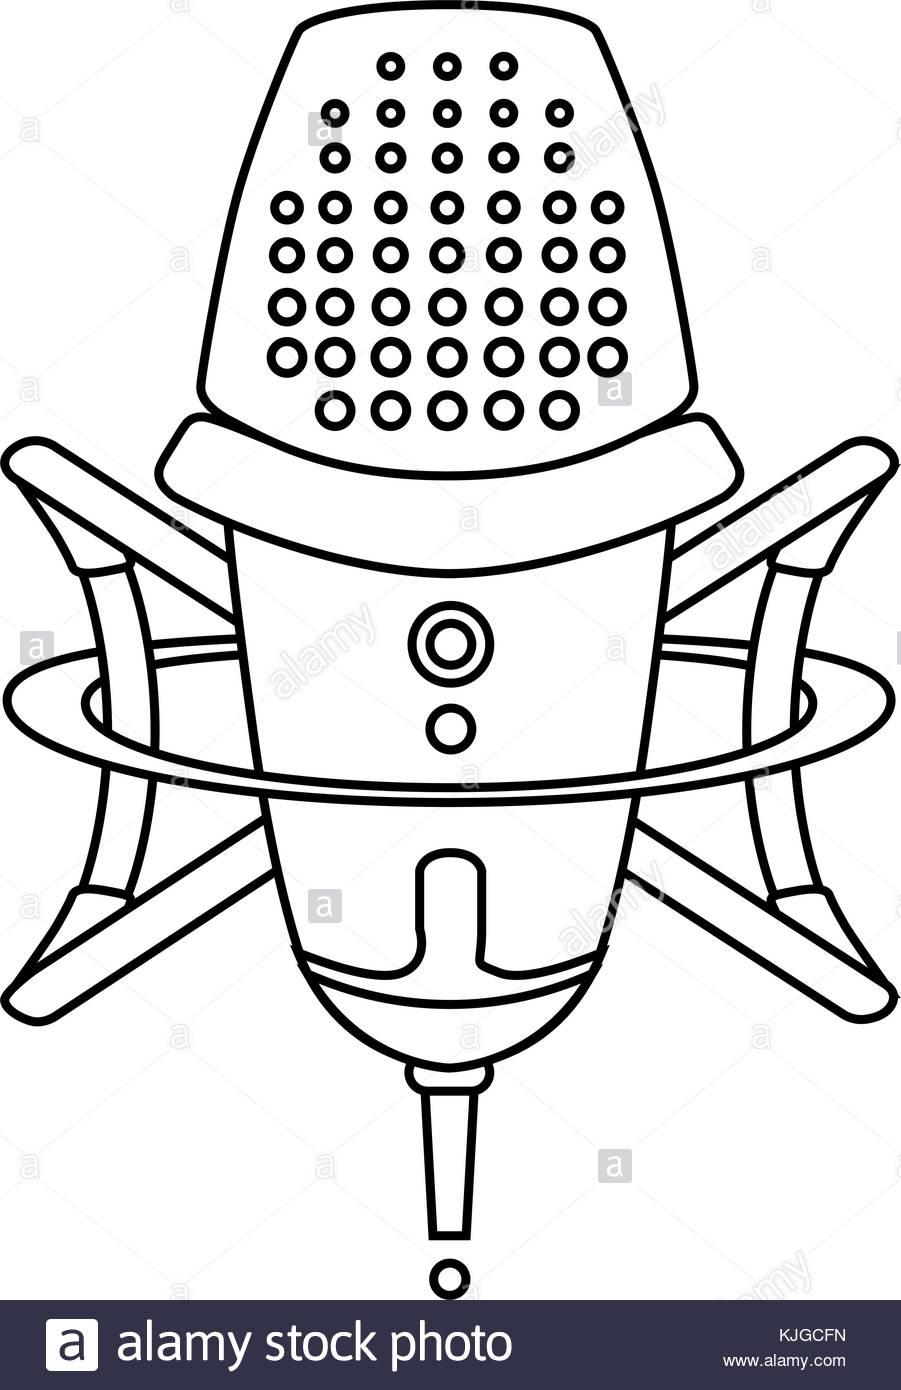 901x1390 Microphone Logo Stock Photos Amp Microphone Logo Stock Images